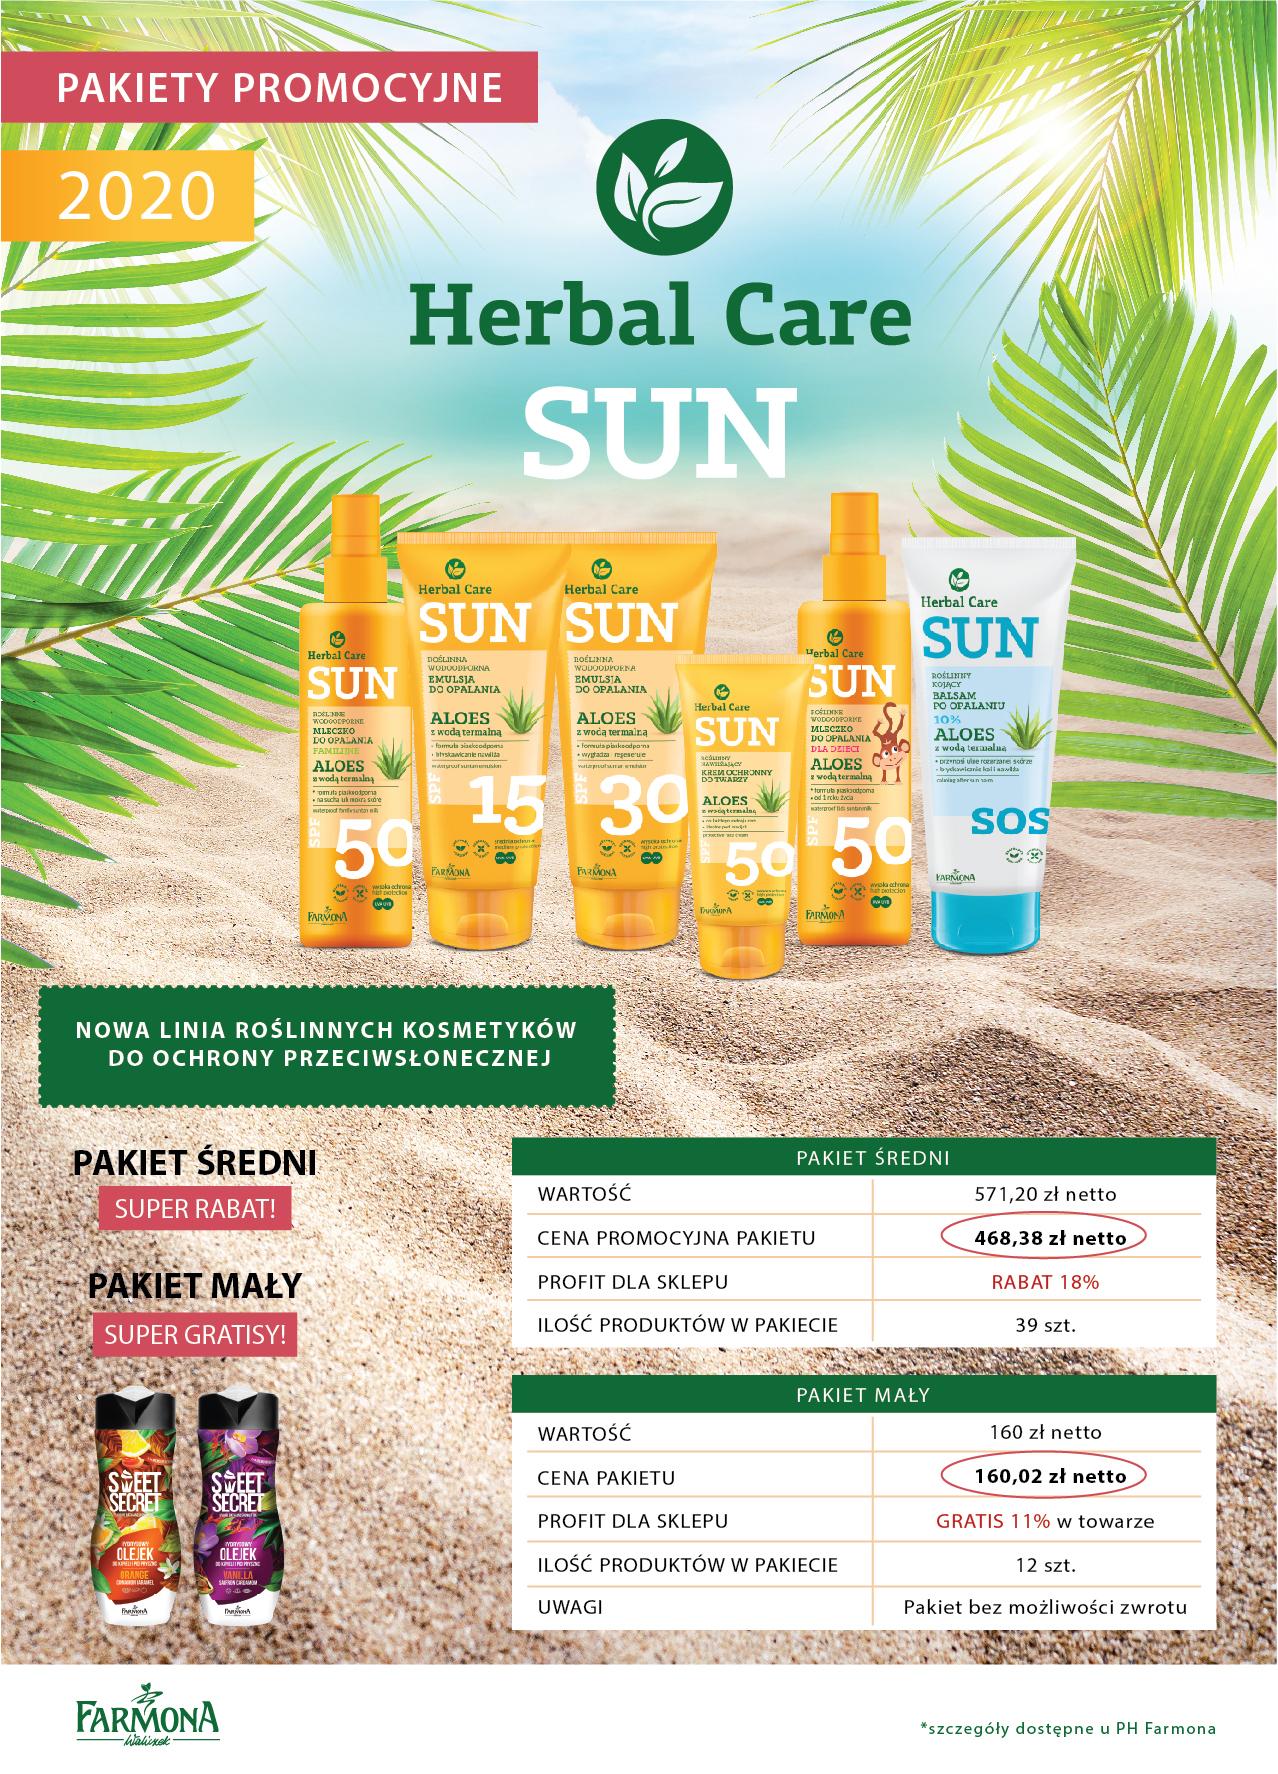 portfolio/017/105117/Herbal_Care_PAKIETY_PROMOCYJNE.jpg